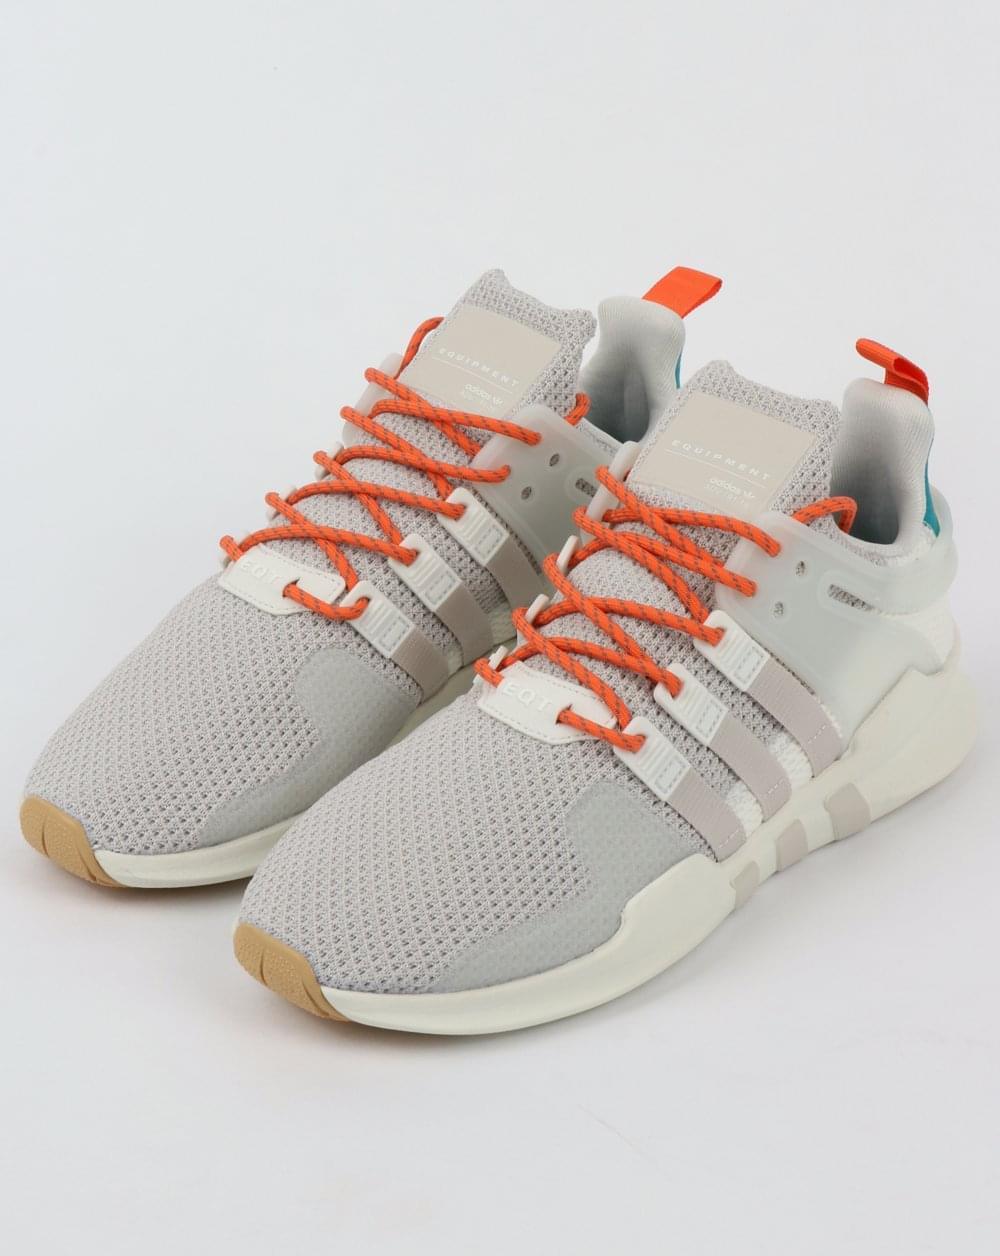 designer fashion 84728 04add Adidas EQT Support Adv Summer Trainers WhiteChalk